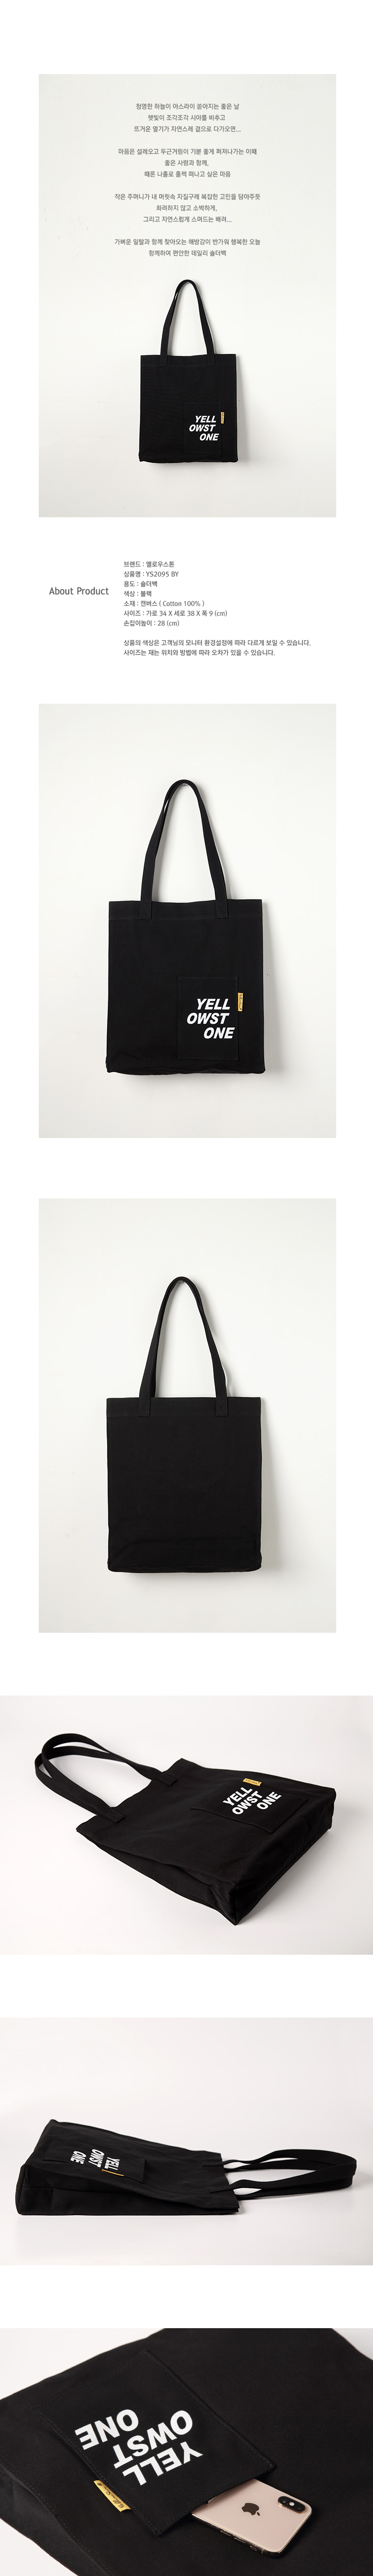 ONE POCKET BAG -YS2095BY /BLACK